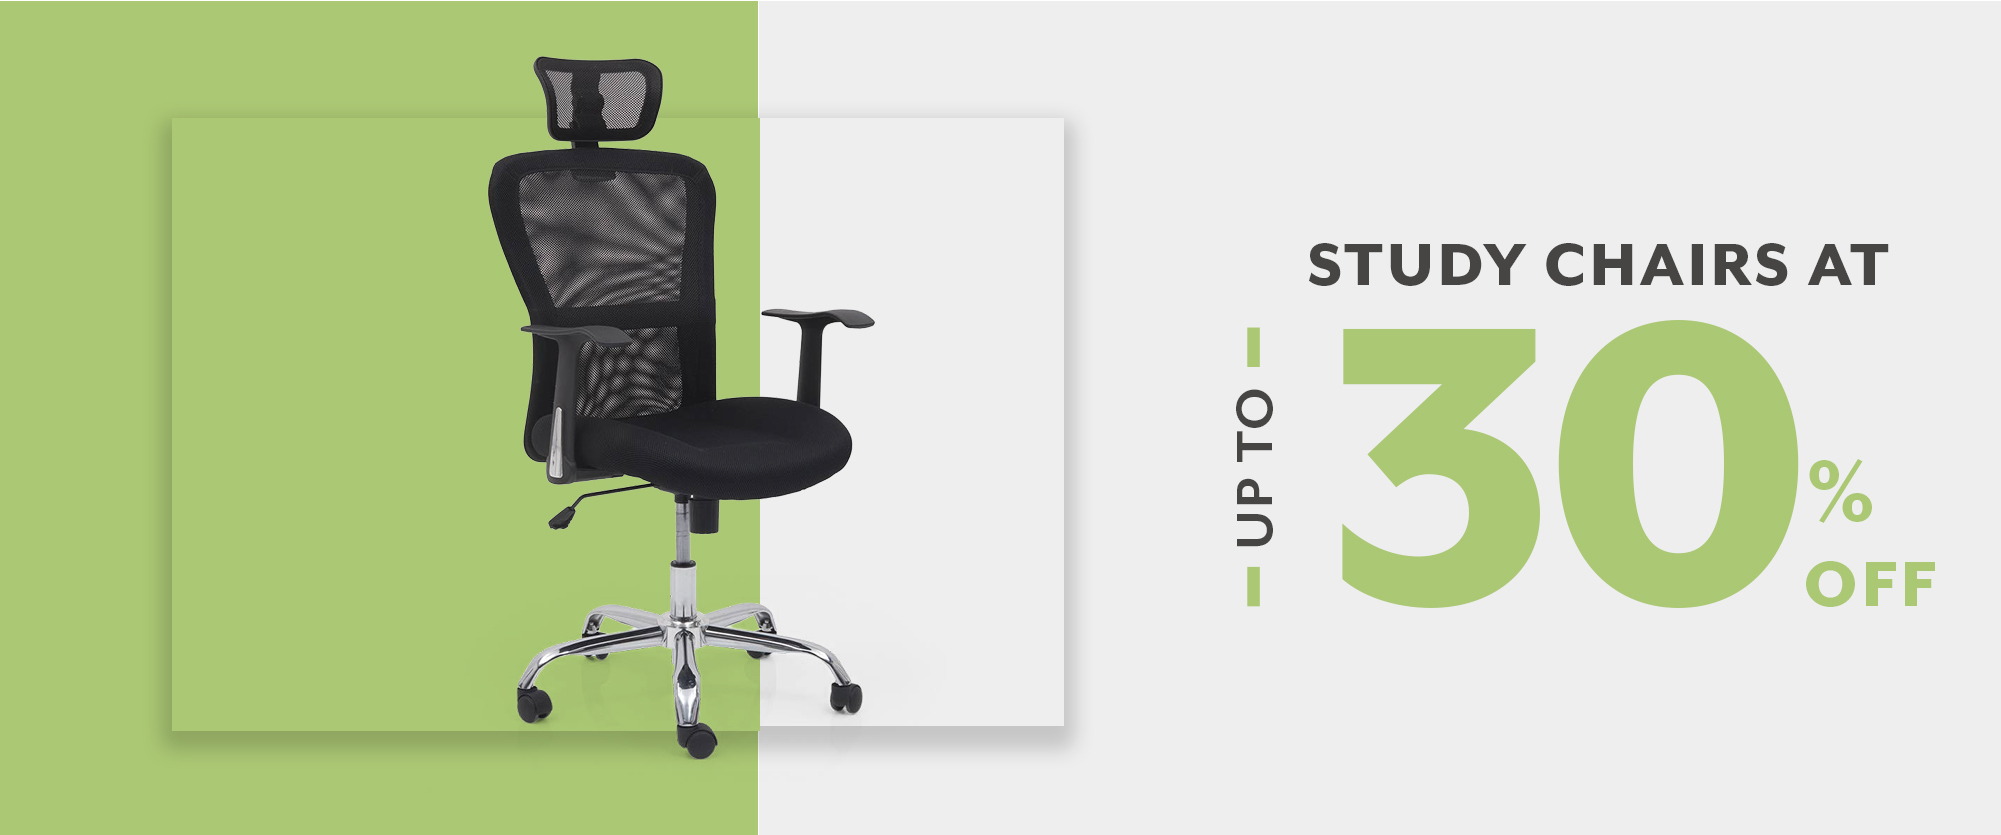 Ssm june 2021 landing pagedesk   study chairs